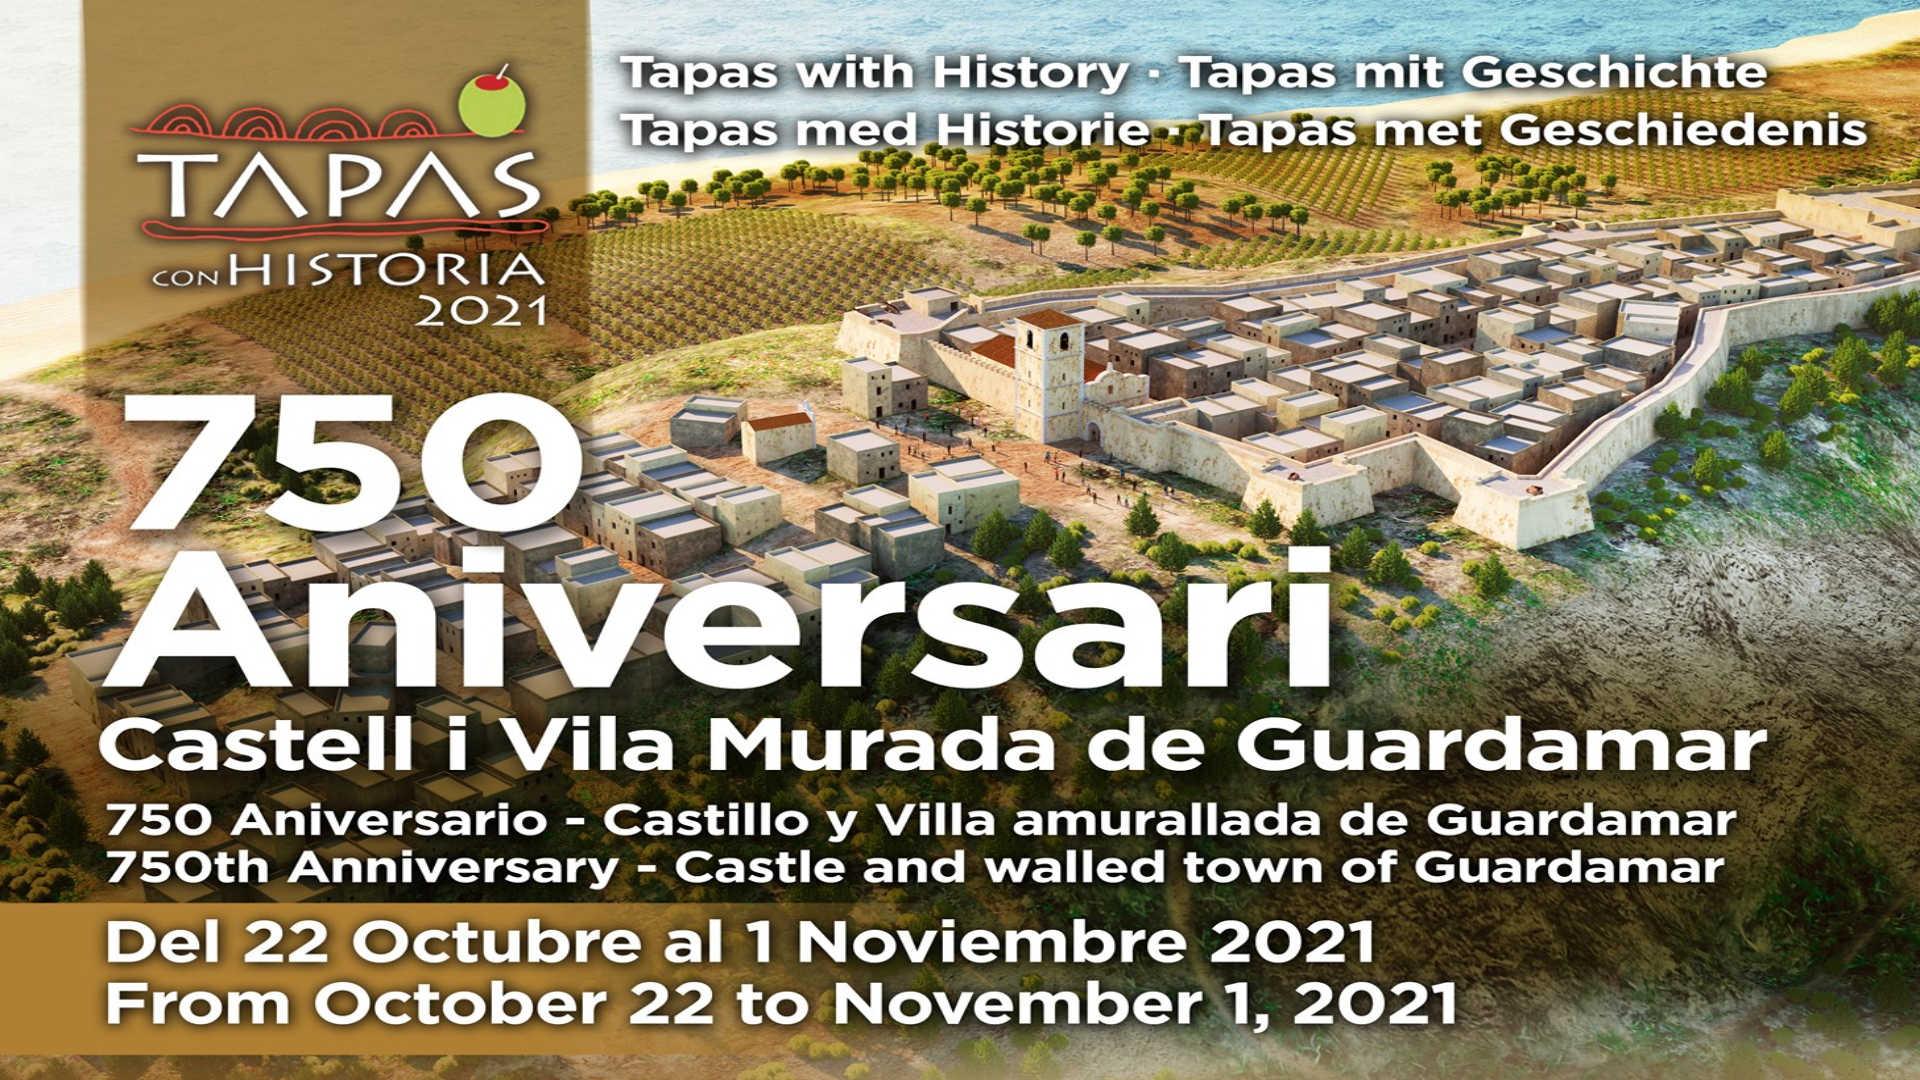 TAPAS CON HISTORIA GUARDAMAR. 750 ANIVERSARI CASTELL I VILA MURADA